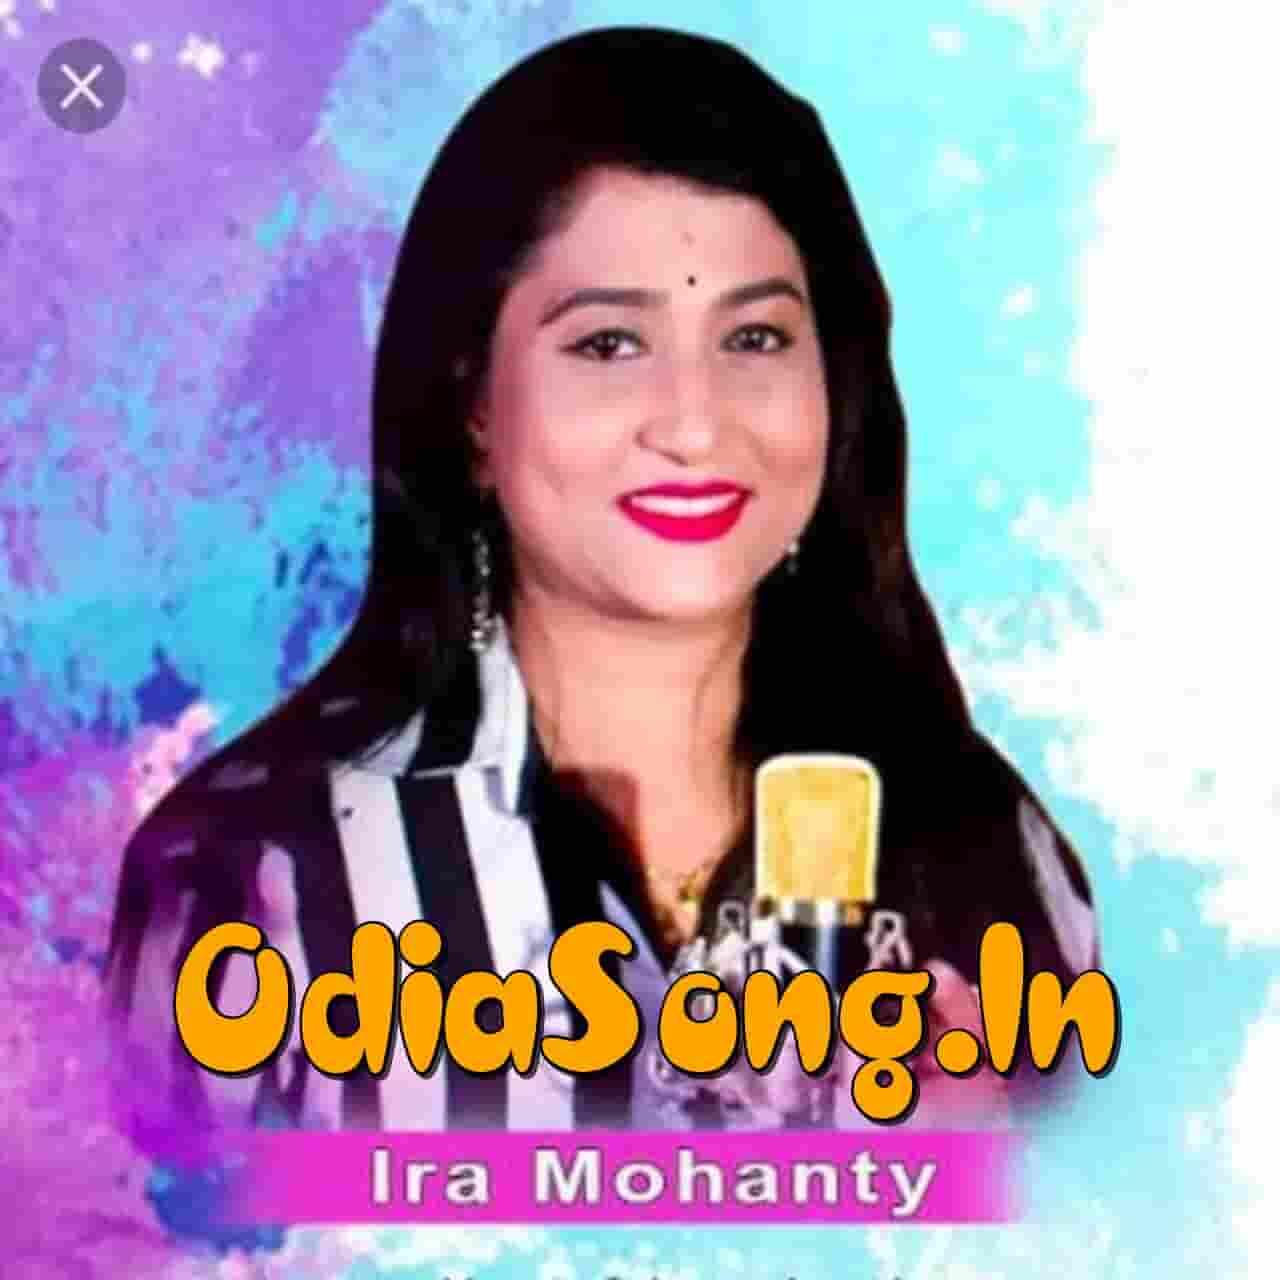 Tora Mora Love Story (Ira Mohanty)